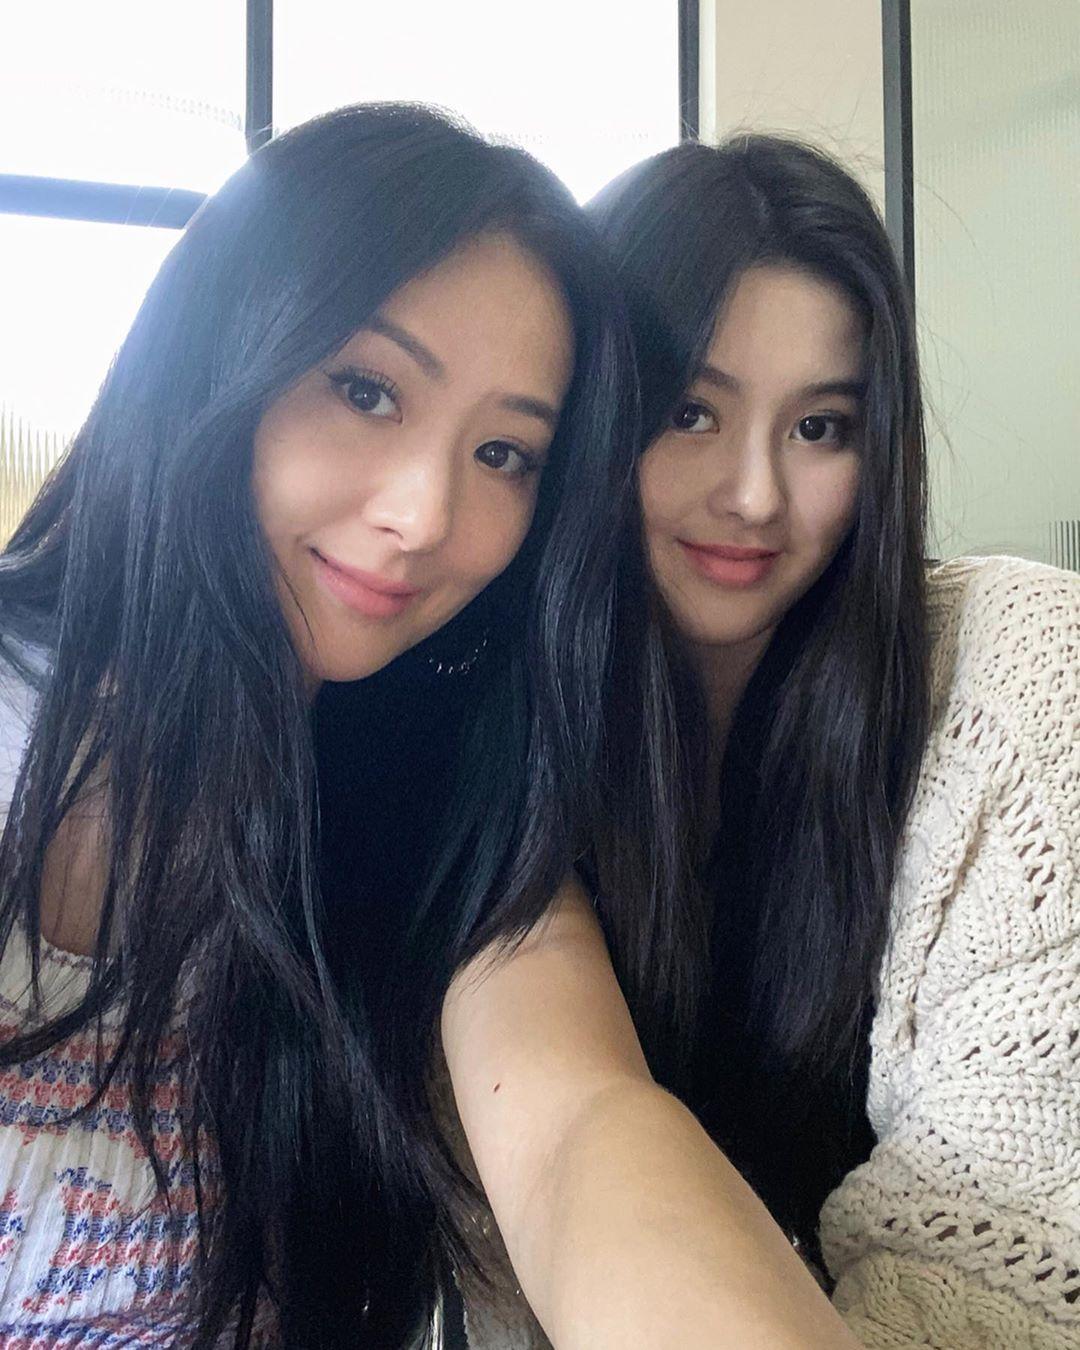 madre e hija muy jóvenes